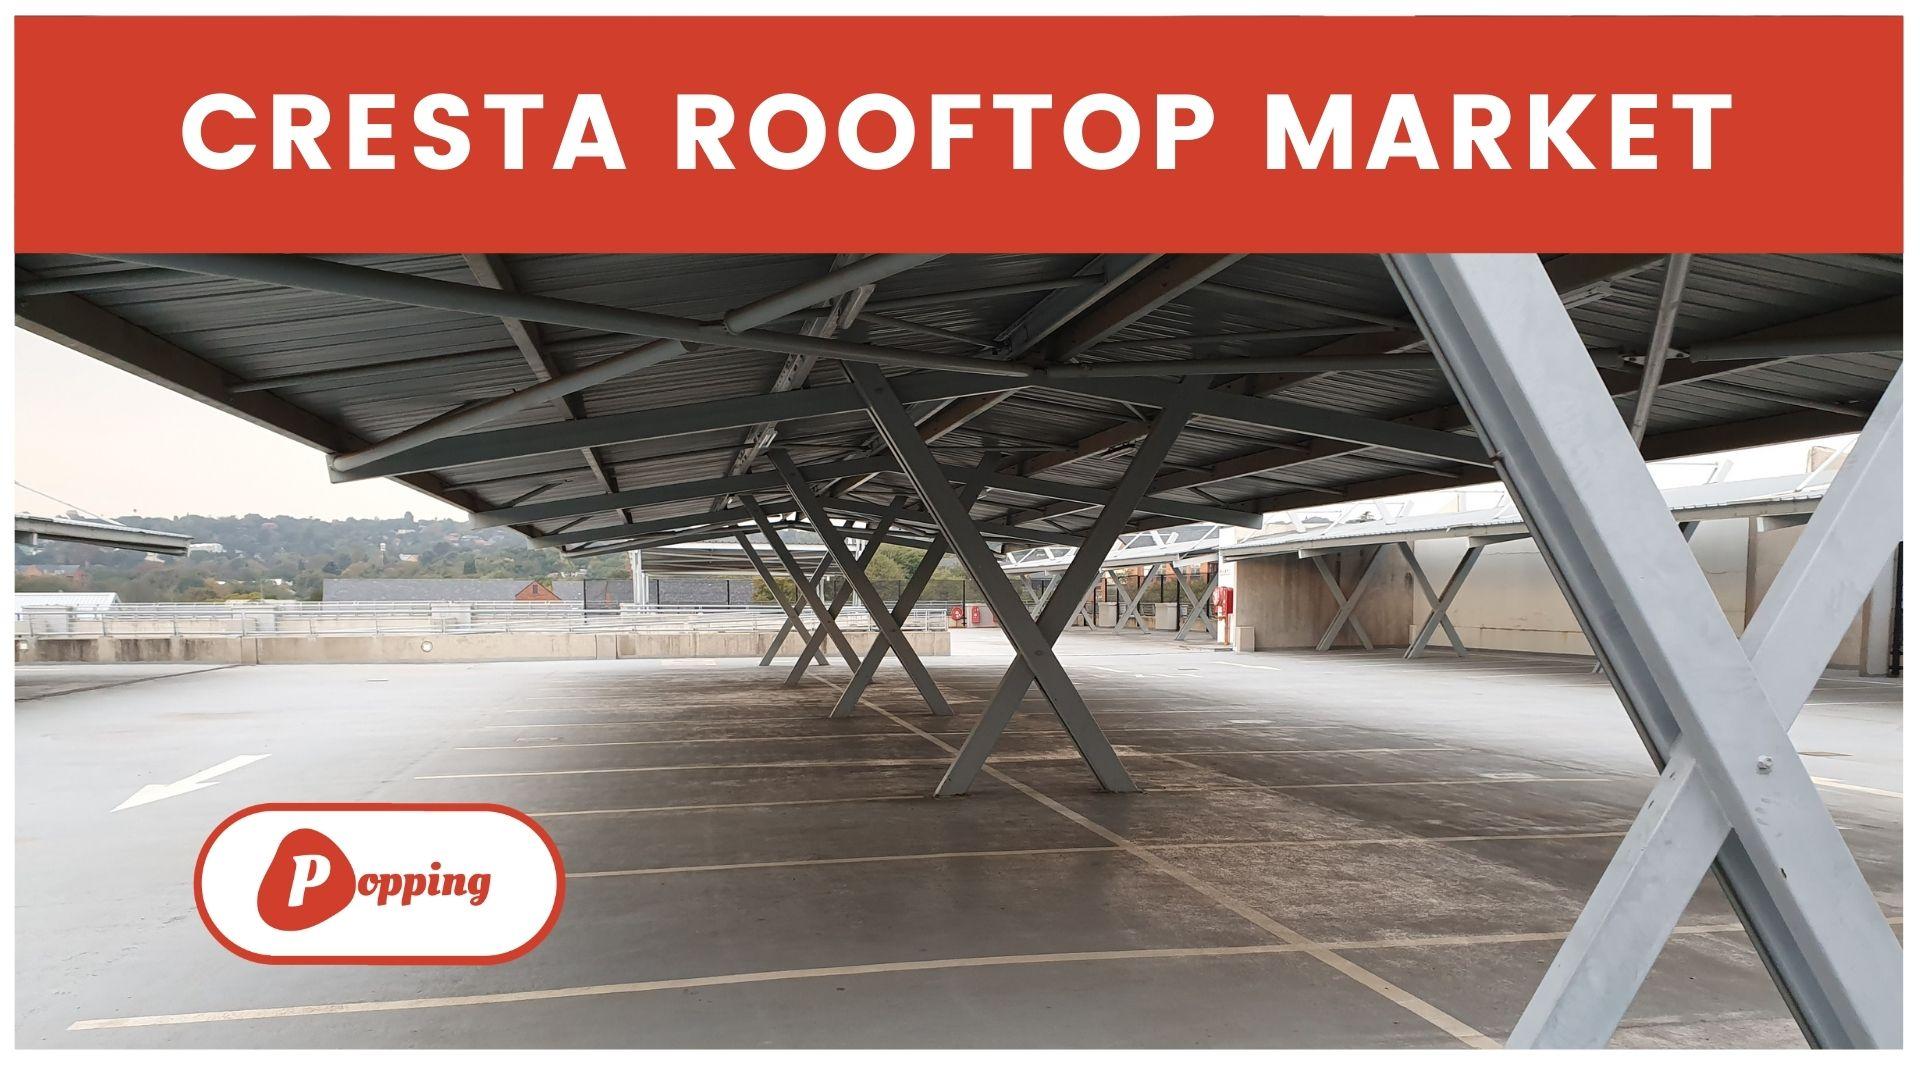 Cresta Rooftop Market – 2 Day weekend